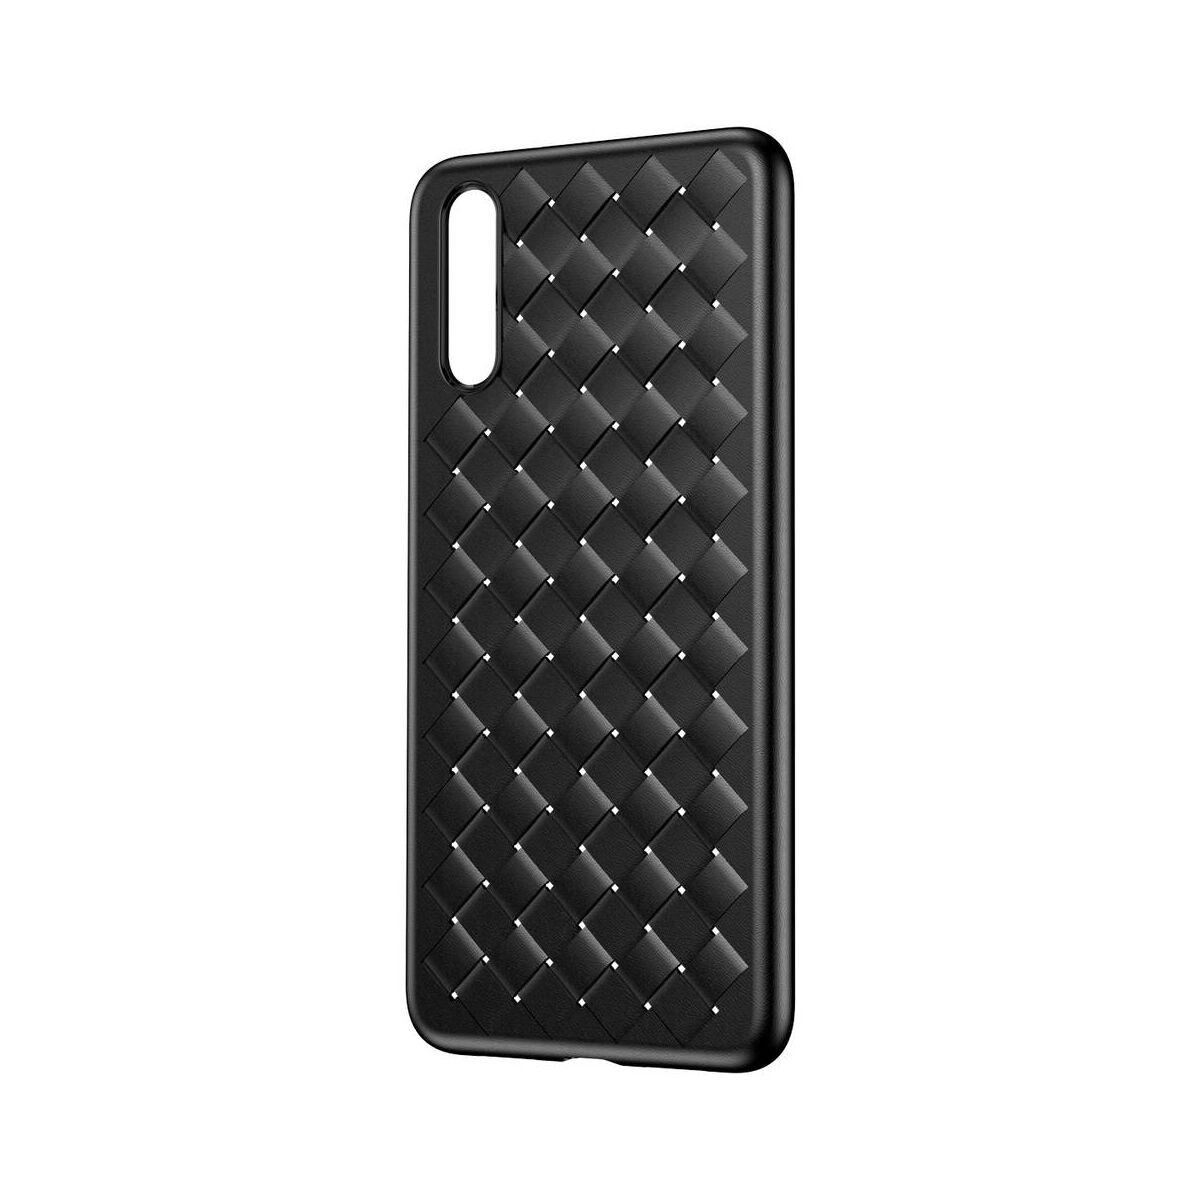 Baseus Huawei P20 tok, BV Weaving, fekete (WIHWP20-BV01)